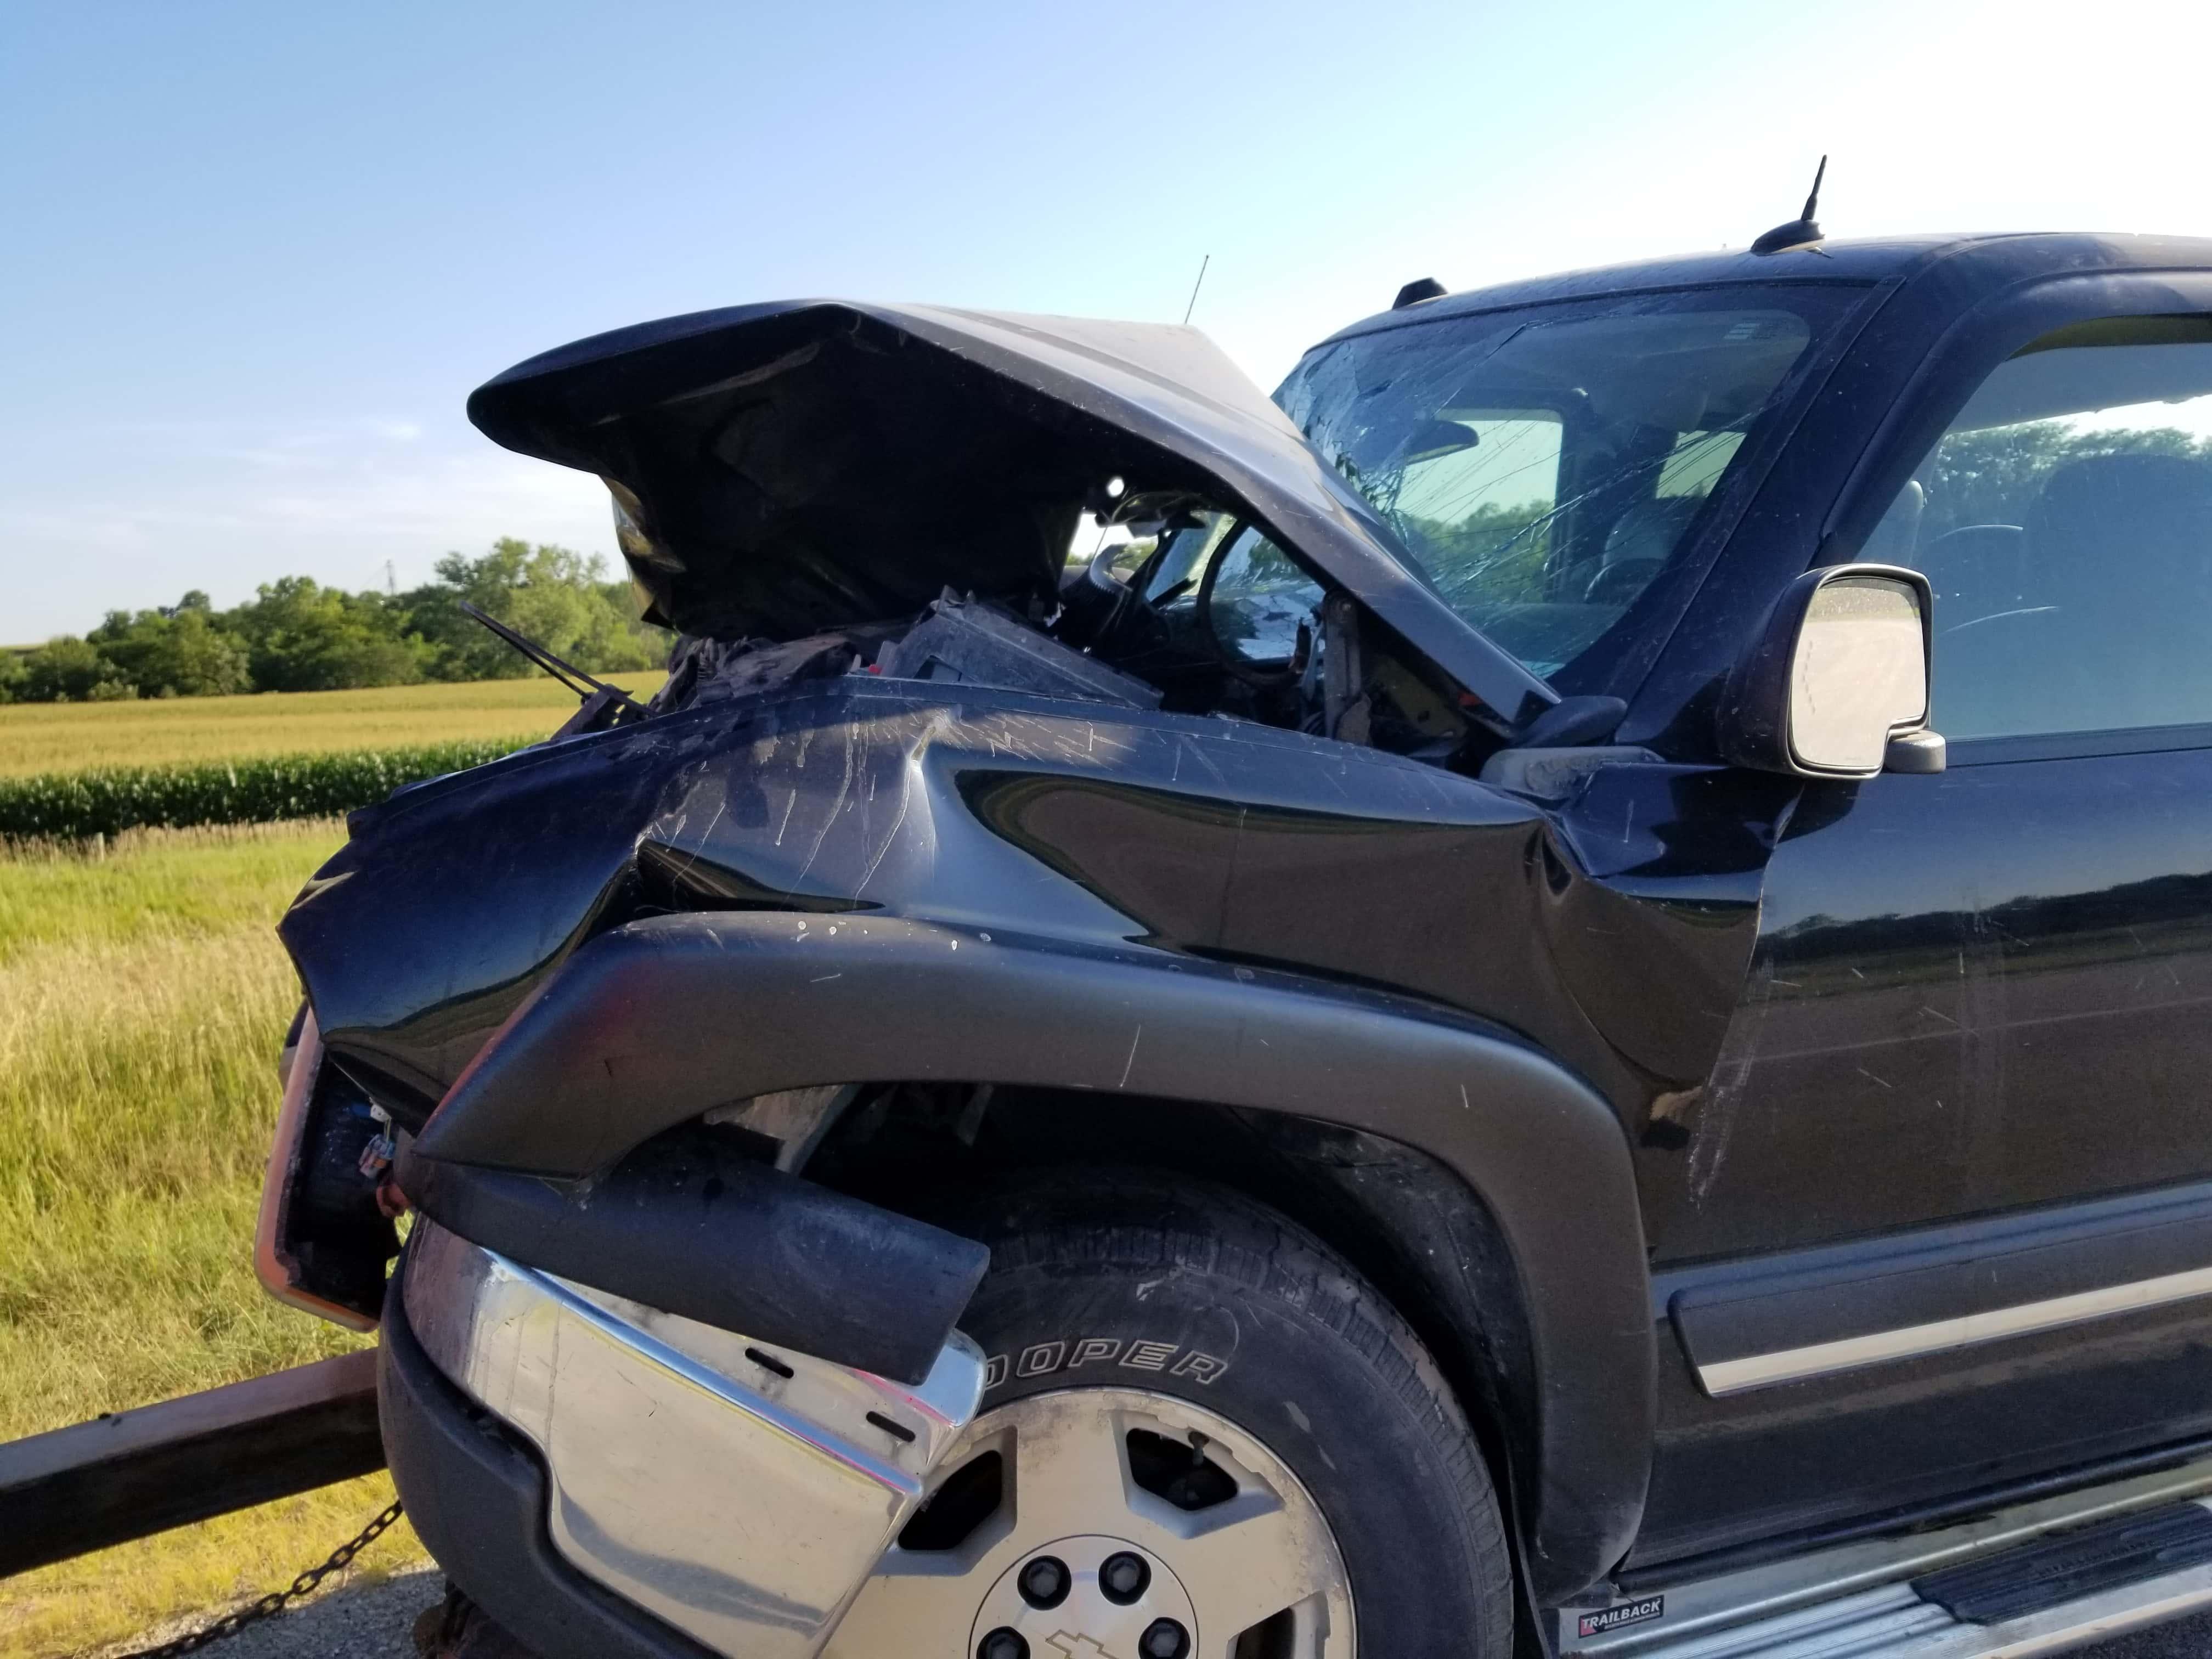 BREAKING: New Details Released in Crash That Killed Pleasantville